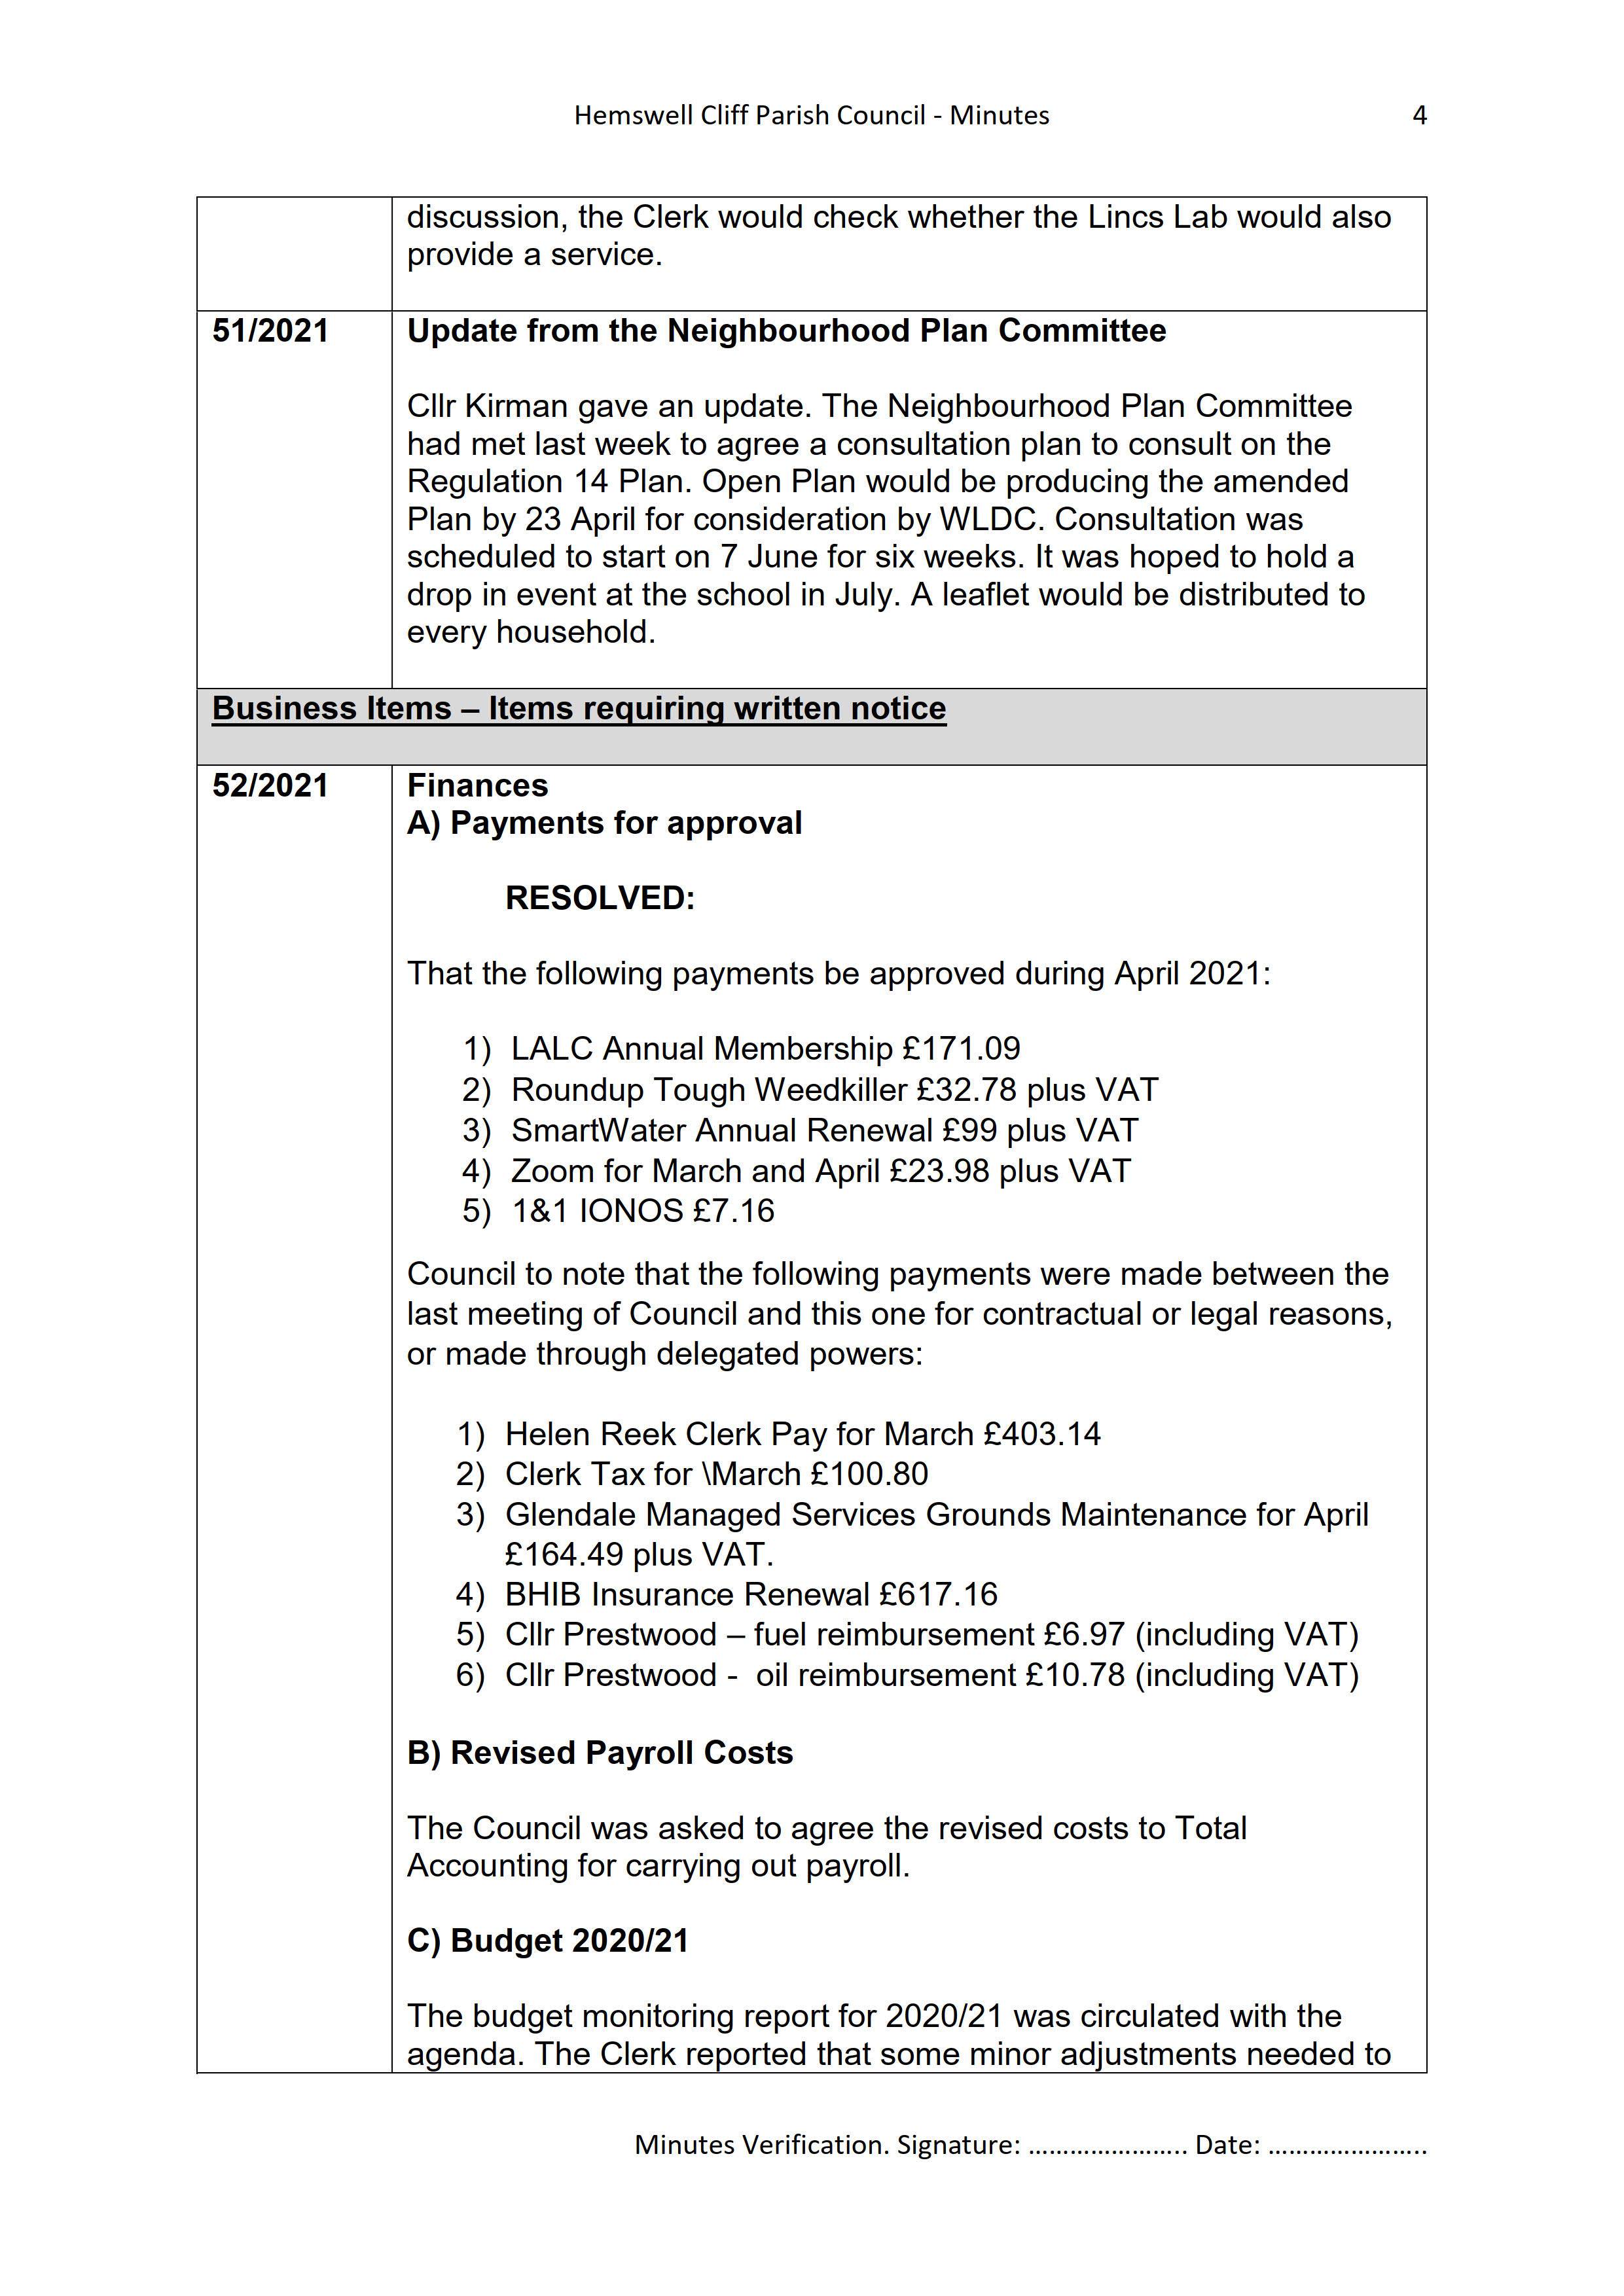 HCPC_Minutes_19.04.21_4.jpg